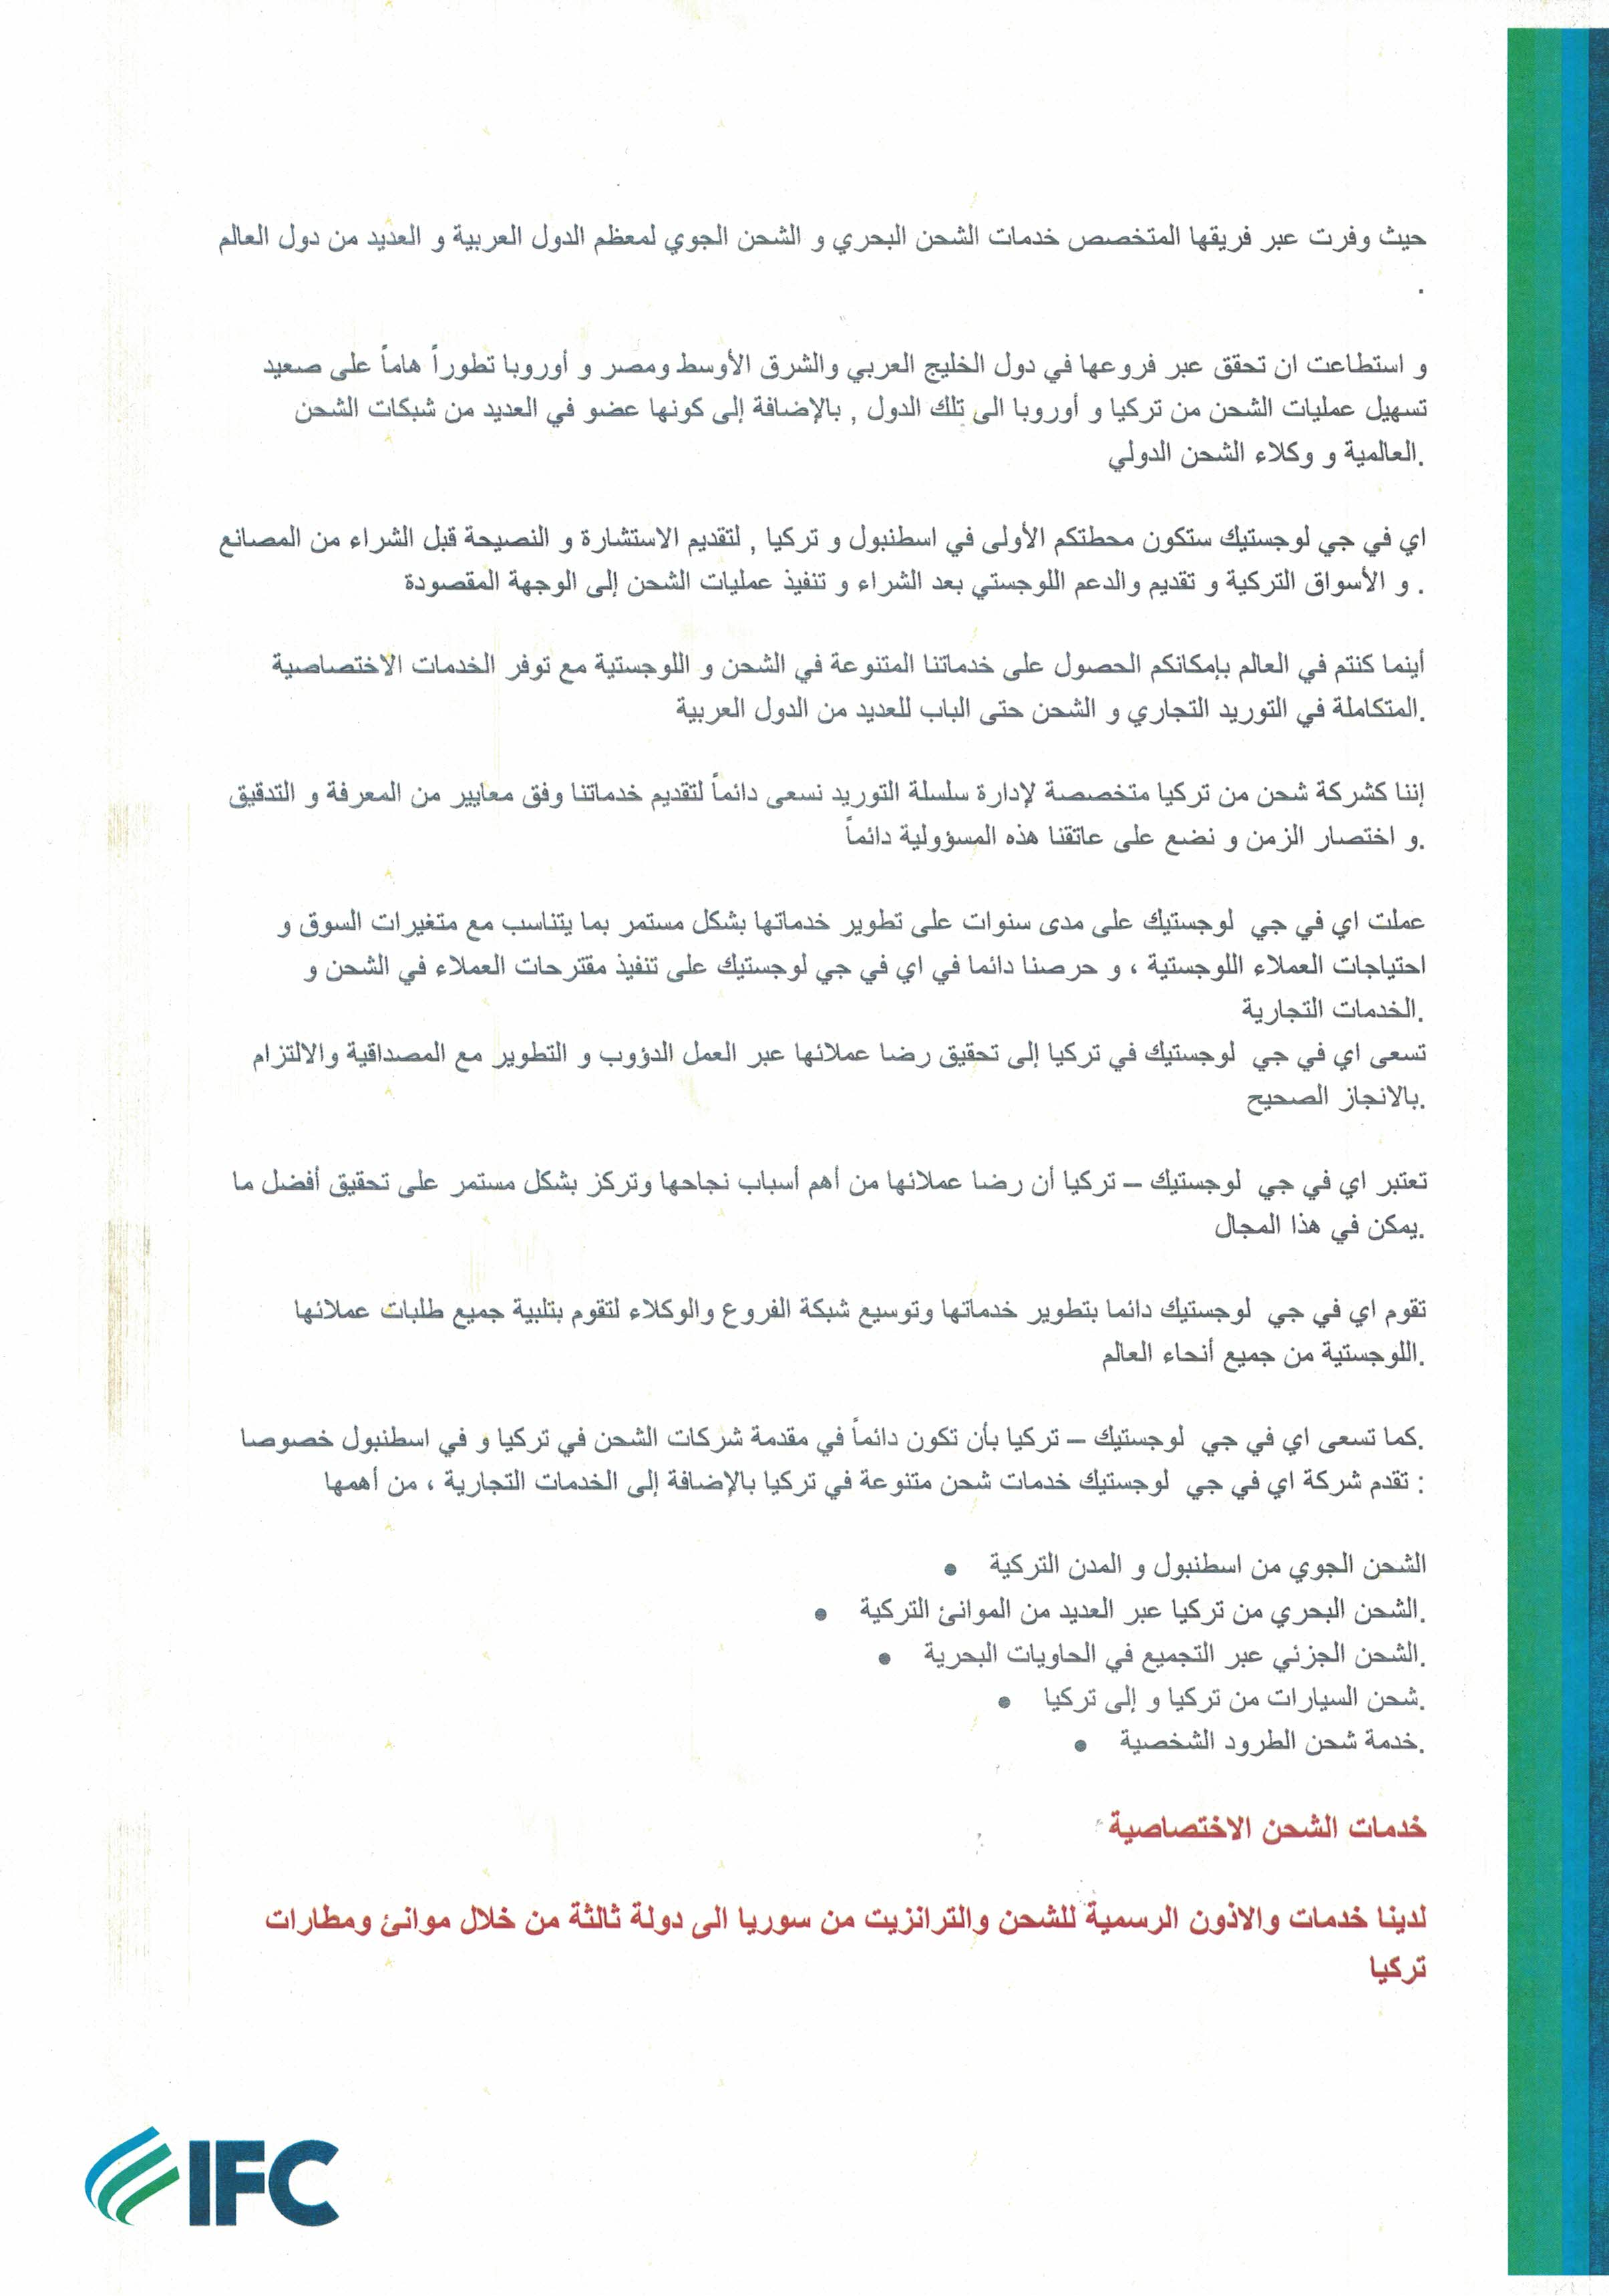 IFC ARABIC (1)